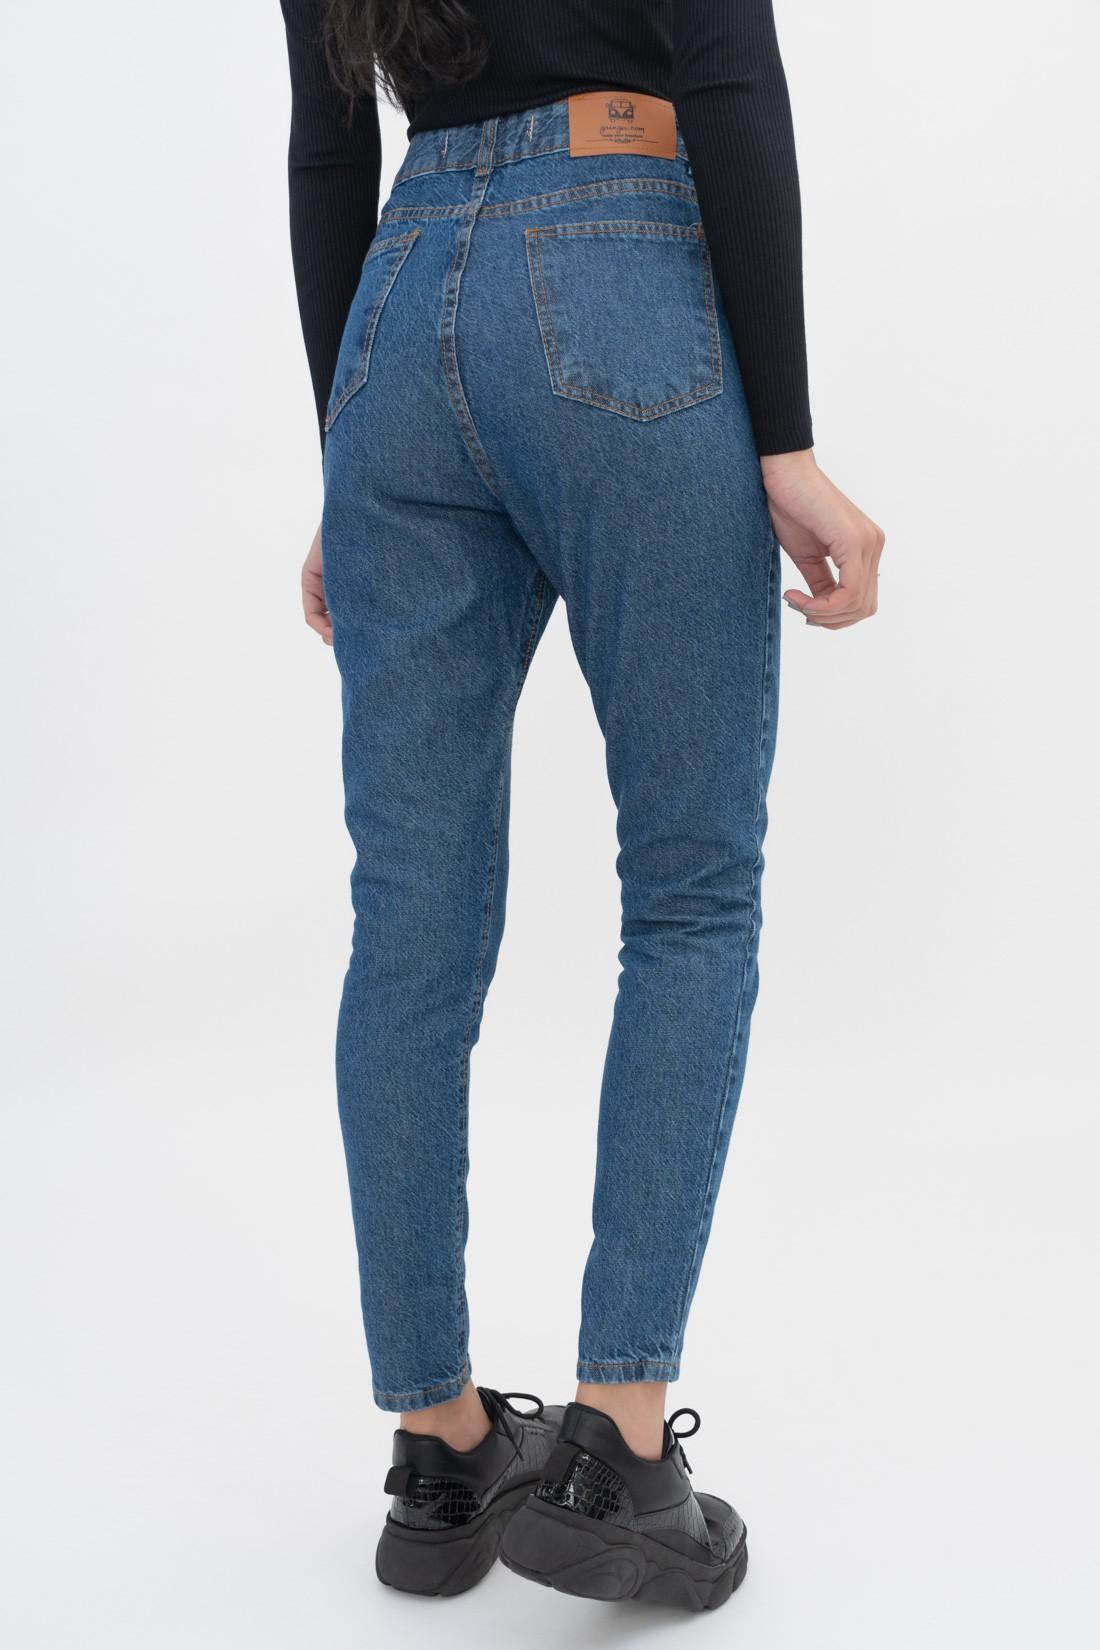 Calca Jeans Mom Fit Vintage